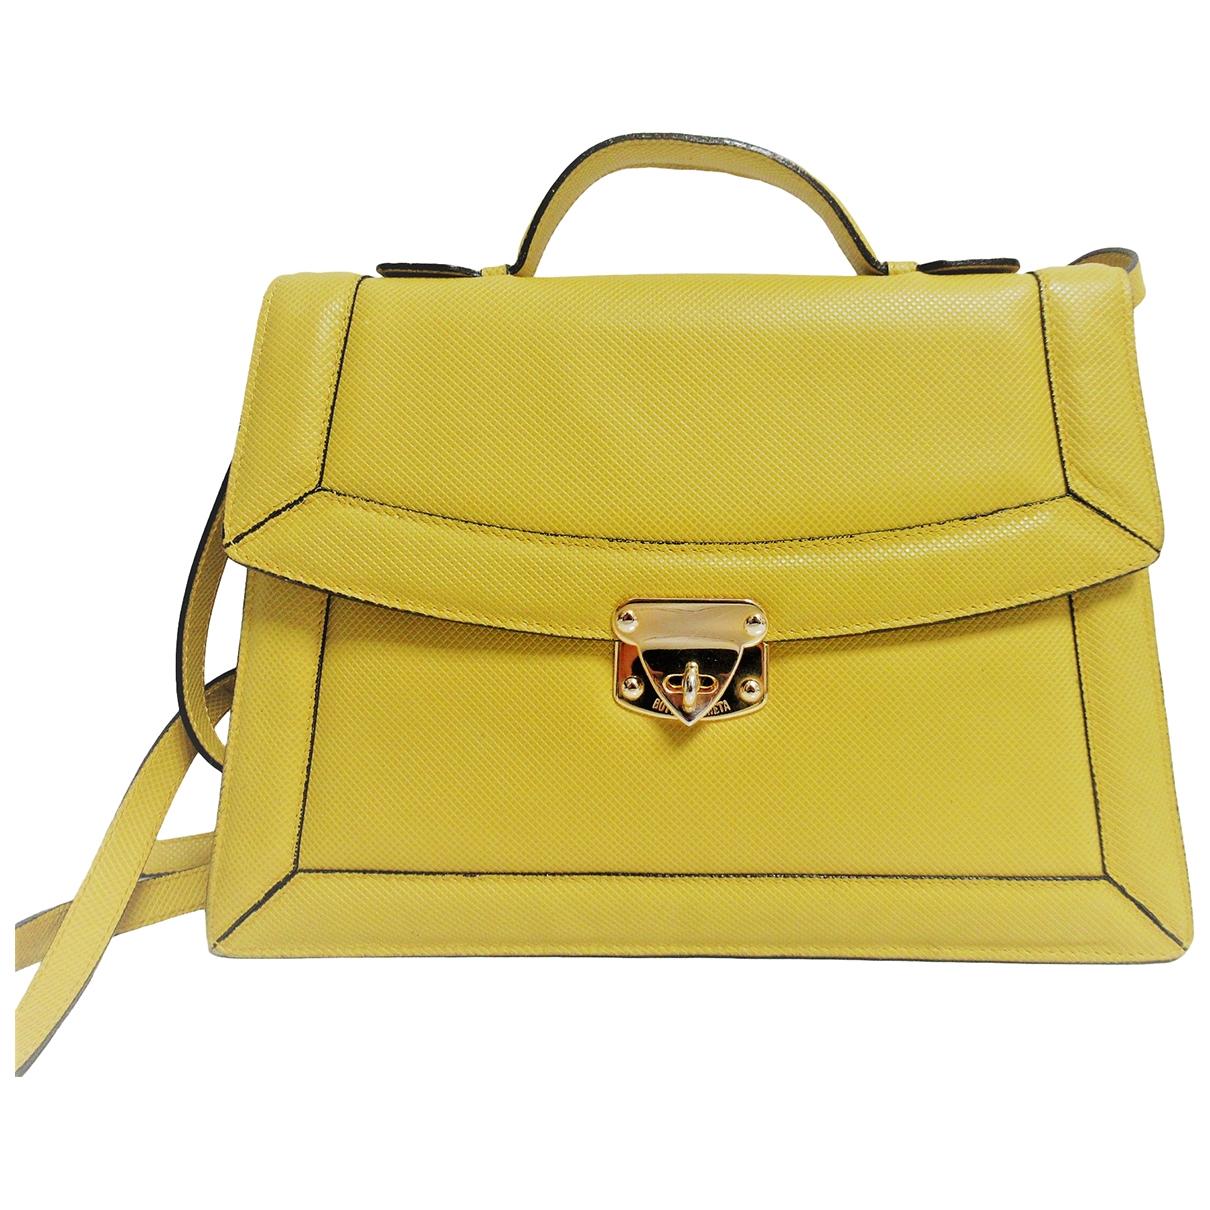 Bottega Veneta \N Handtasche in  Gelb Leder